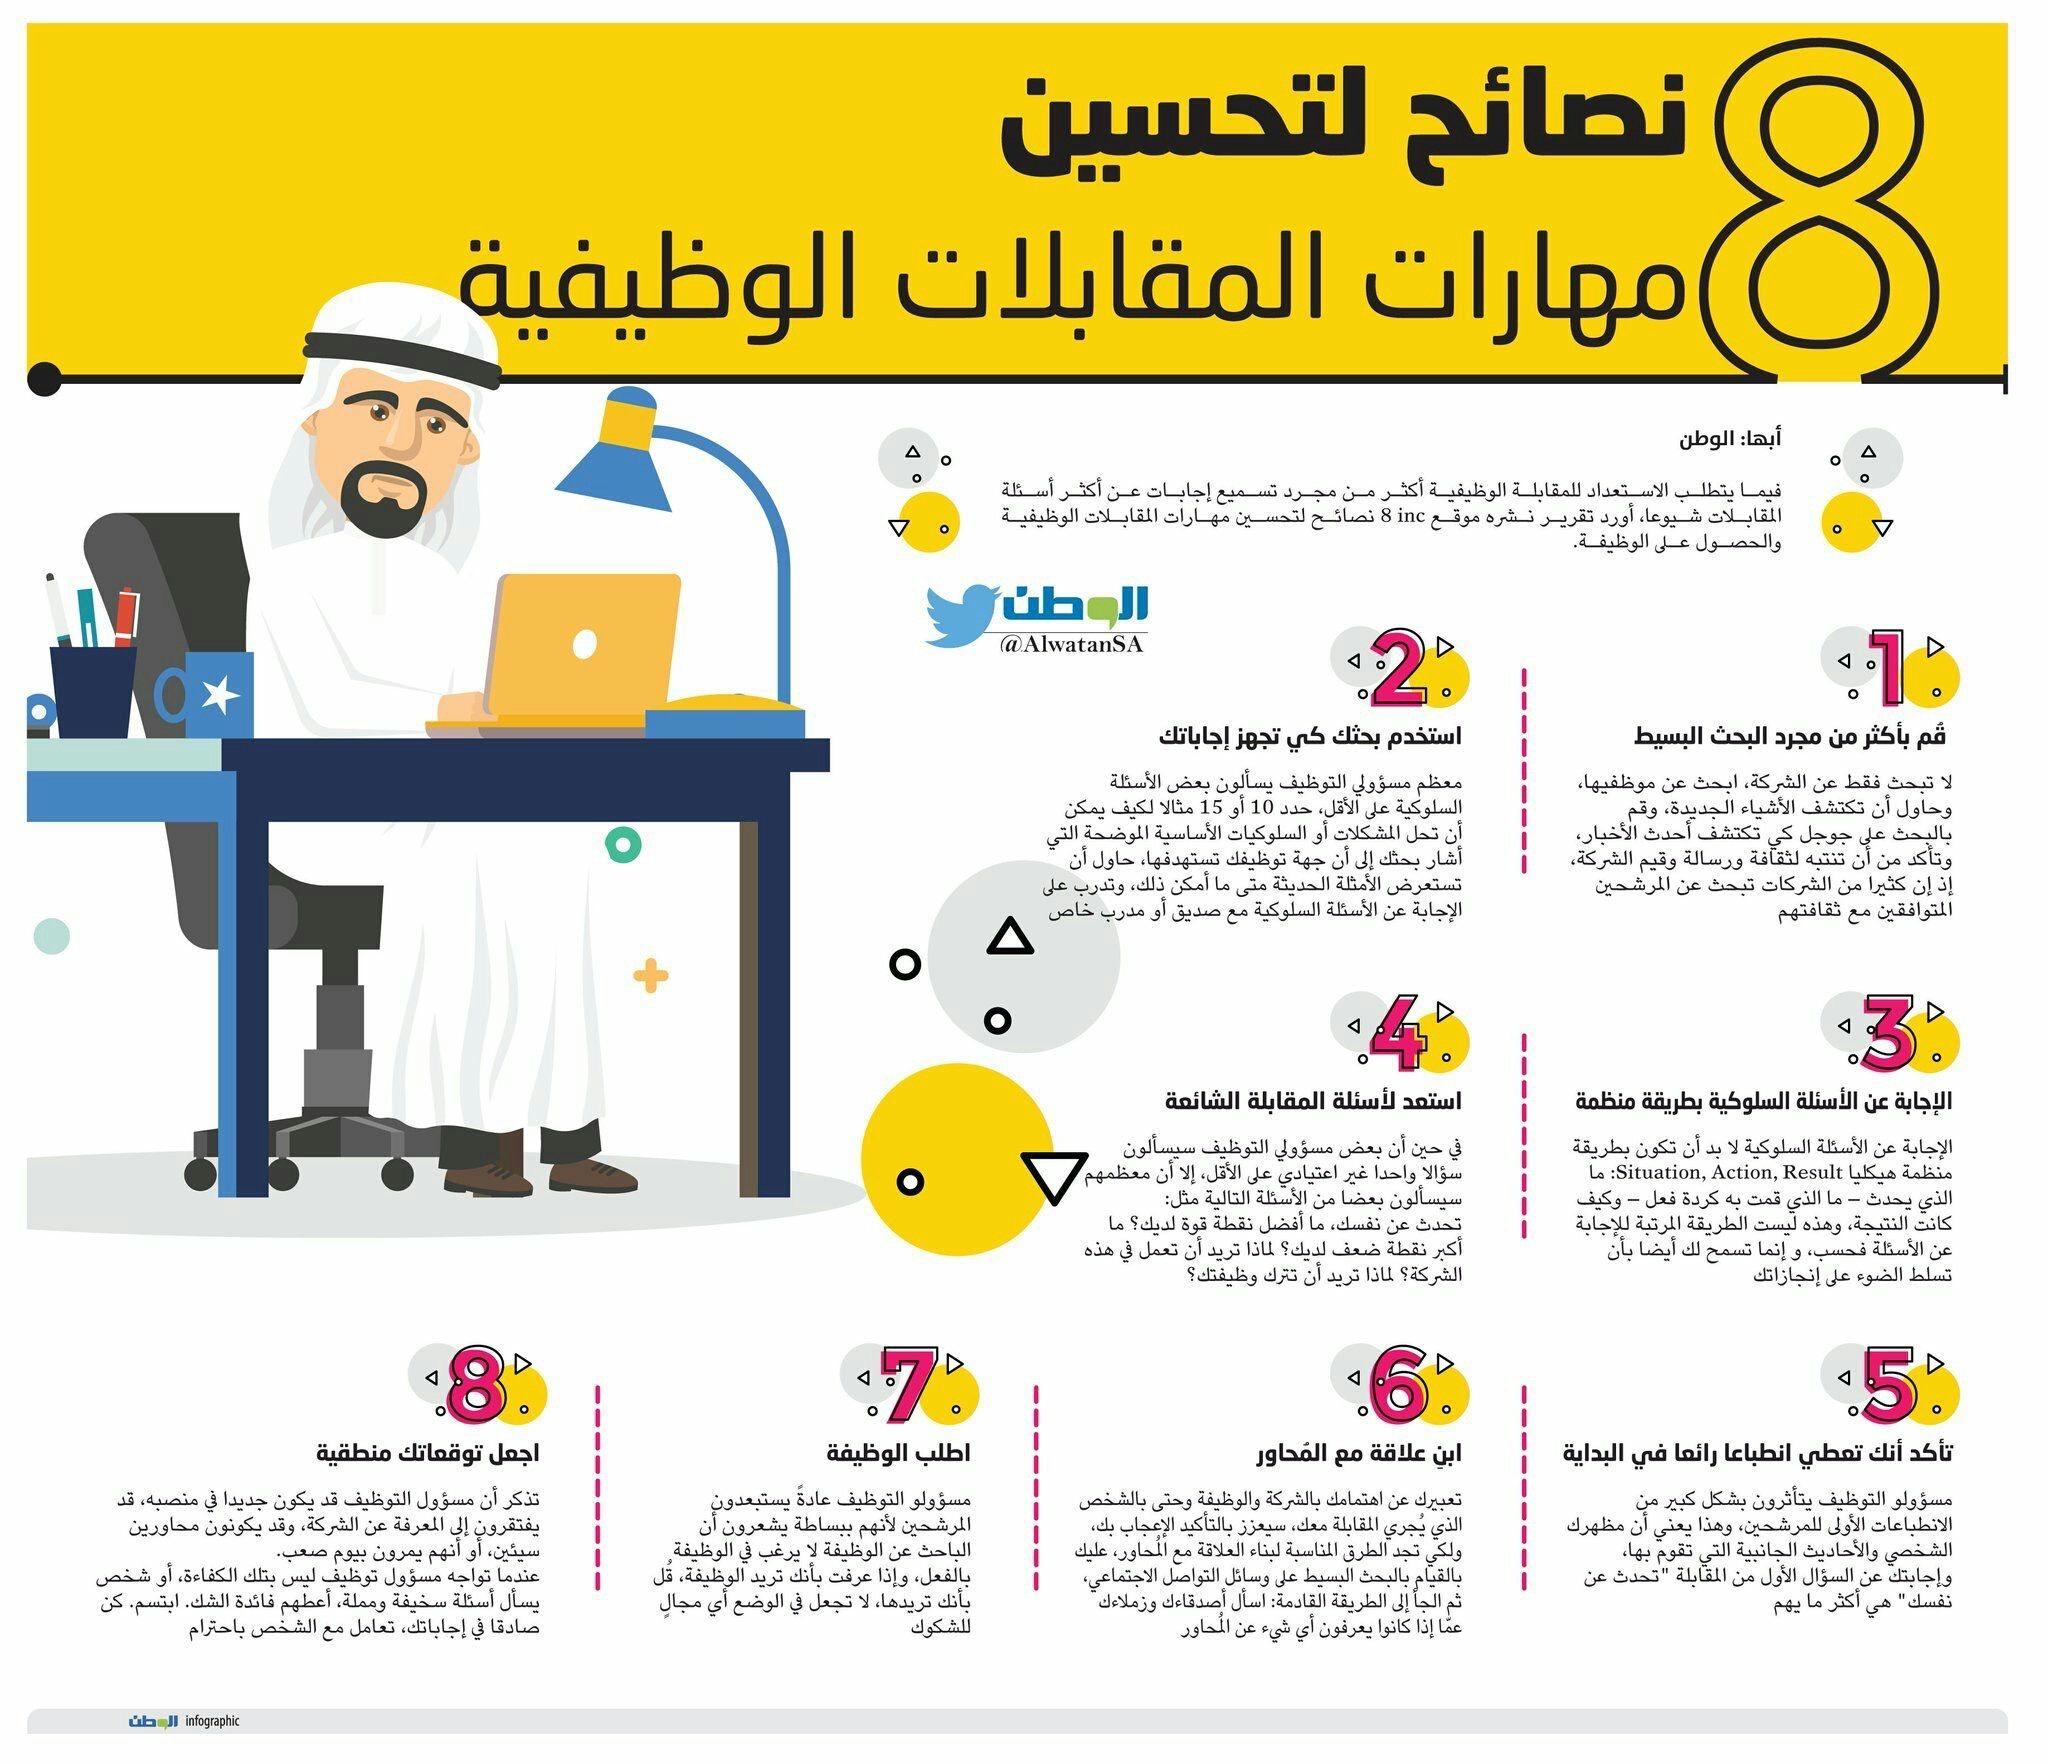 Pin By Hazem Musa On تنمية بشرية بالانجليزي تنمية بشرية للاطفال قصص تنمية بشرية التنمية البشرية وتطوير الذات مجالات التنمية البشرية Learning Websites New Things To Learn Learn Arabic Language